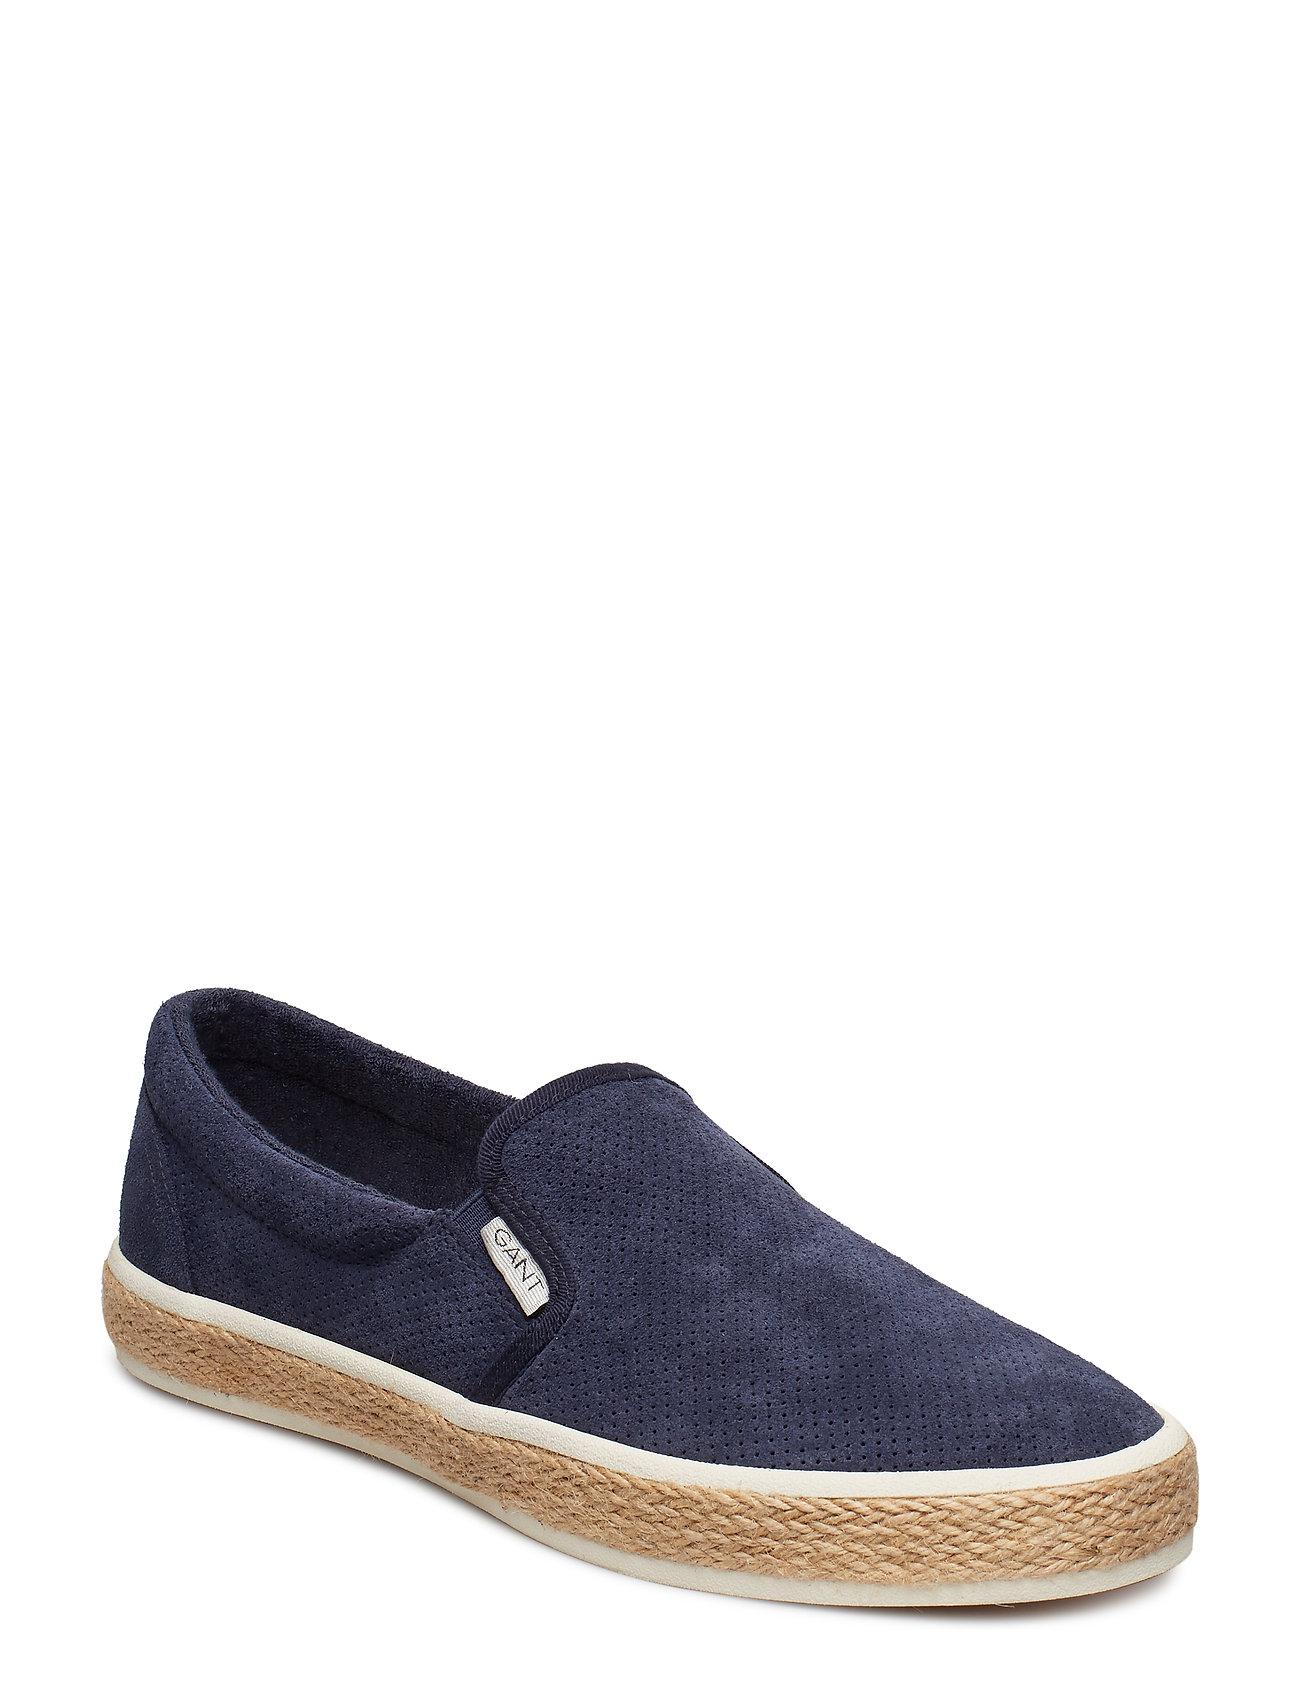 GANT Fresno Slip-on shoes